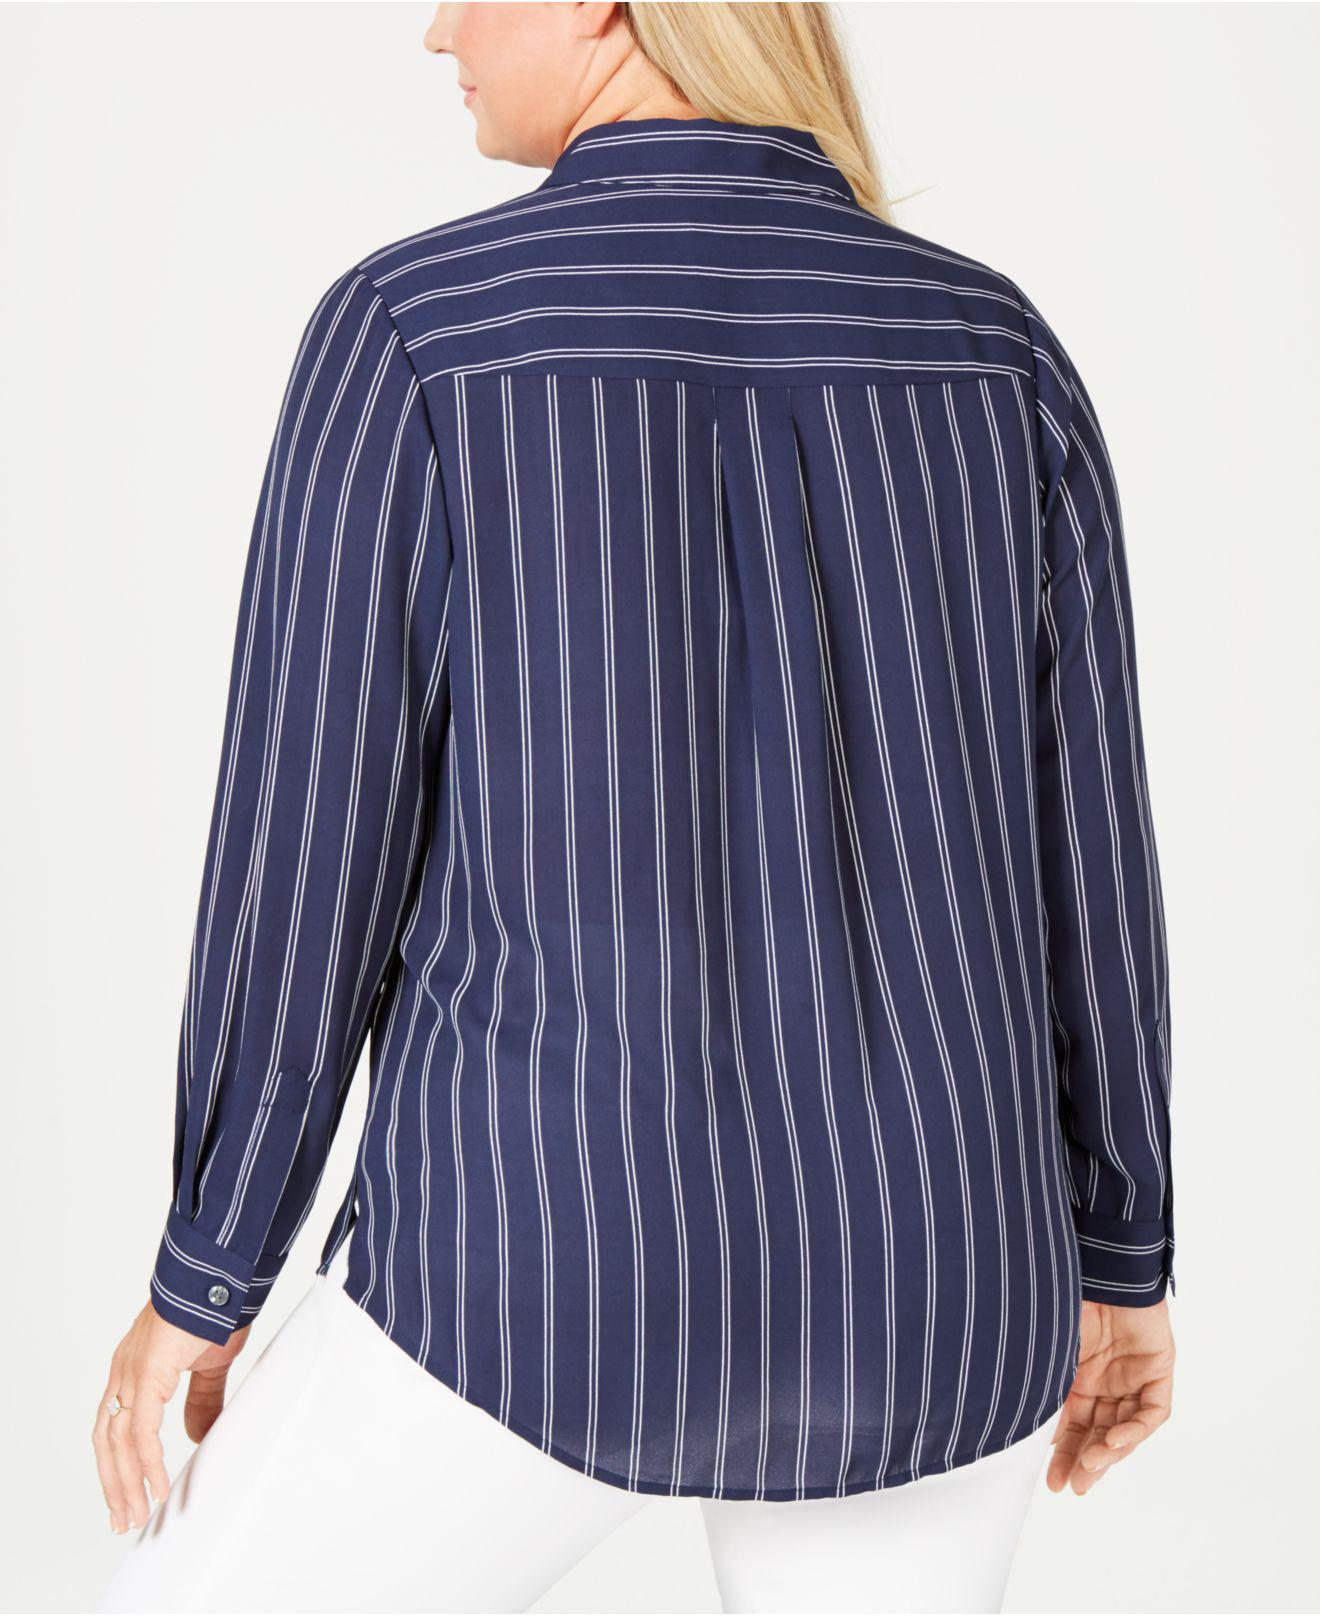 230eaa888d8 Lyst - Charter Club Plus Size Striped Shirt